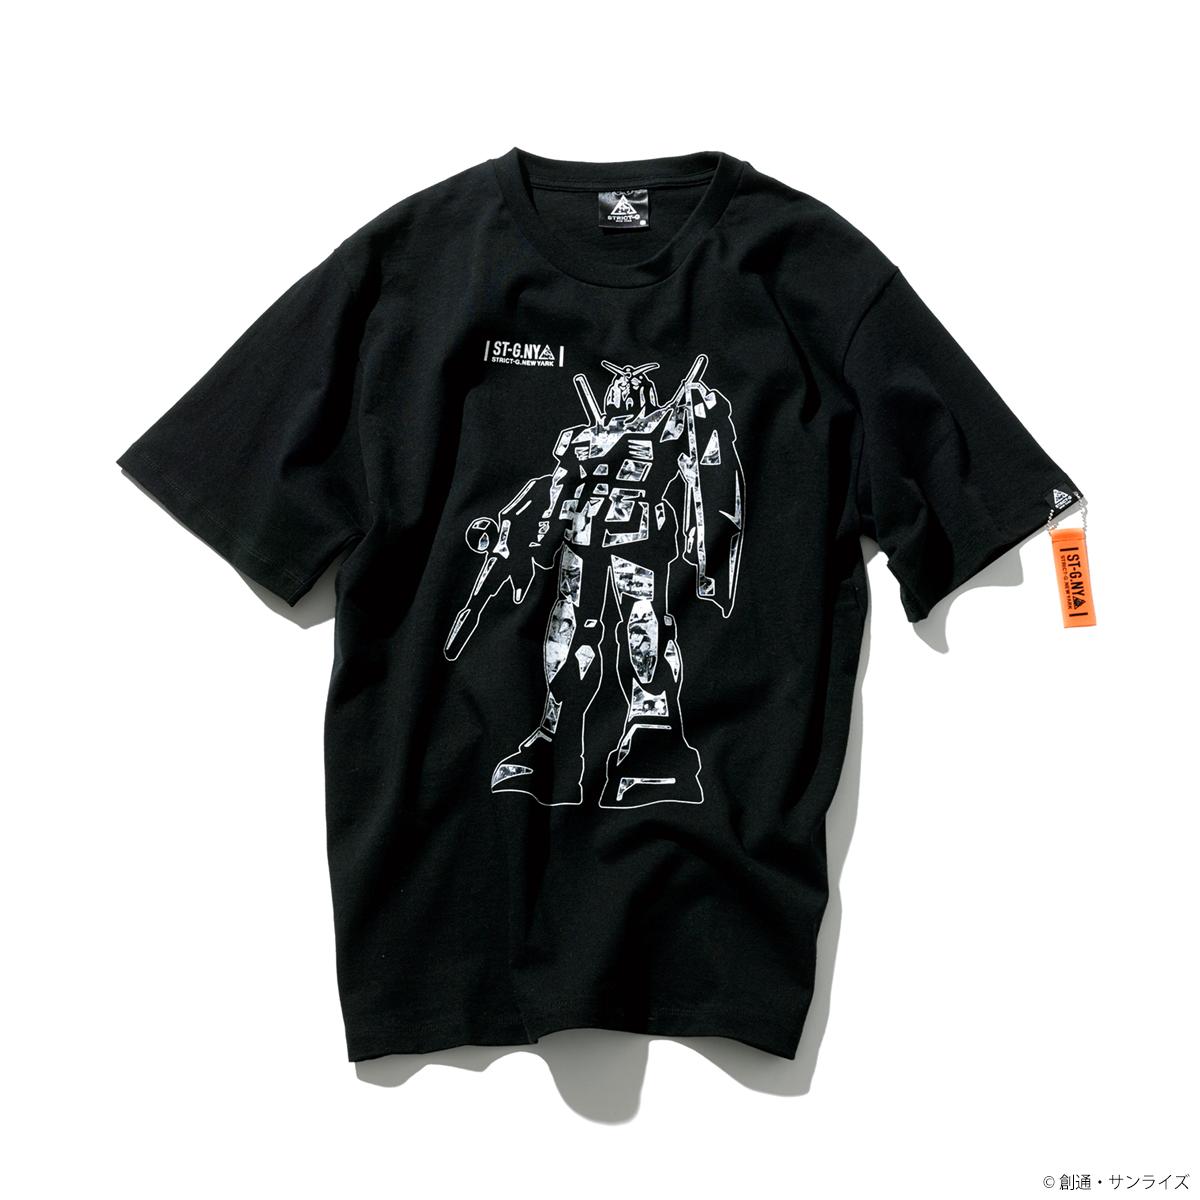 Gundam T-shirt—Mobile Suit Gundam/STRICT-G NEW YARK Collaboration